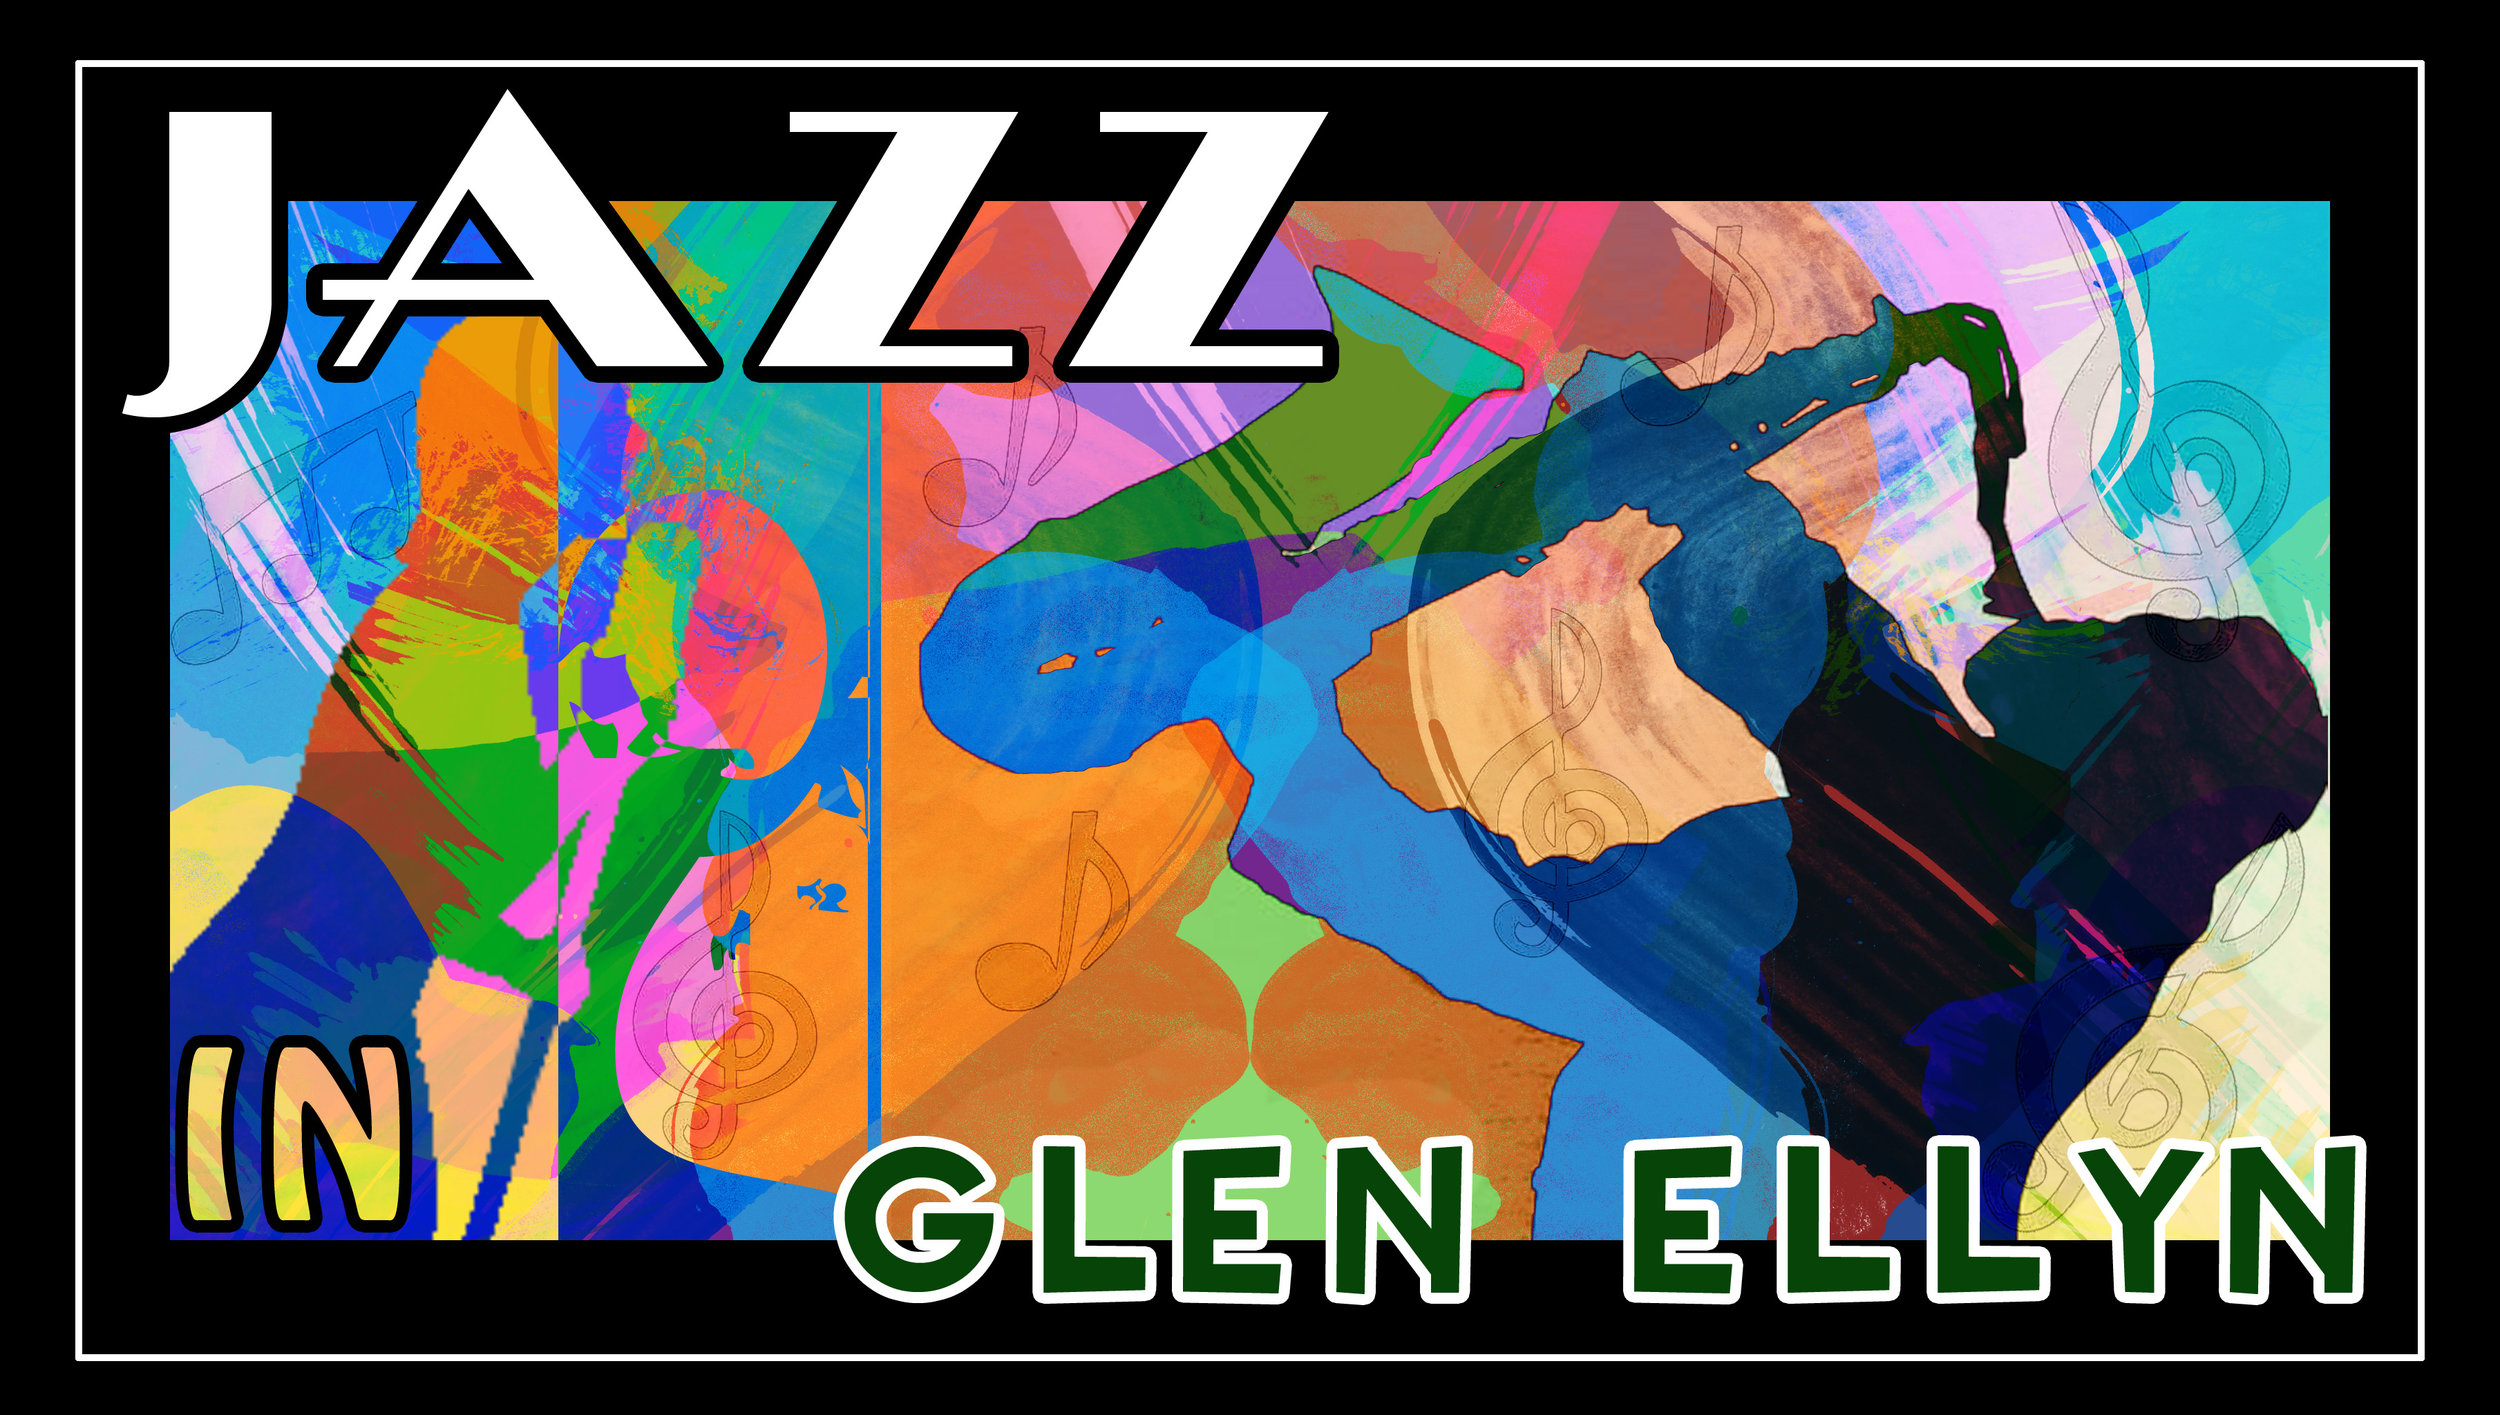 jazz fest1b.jpg